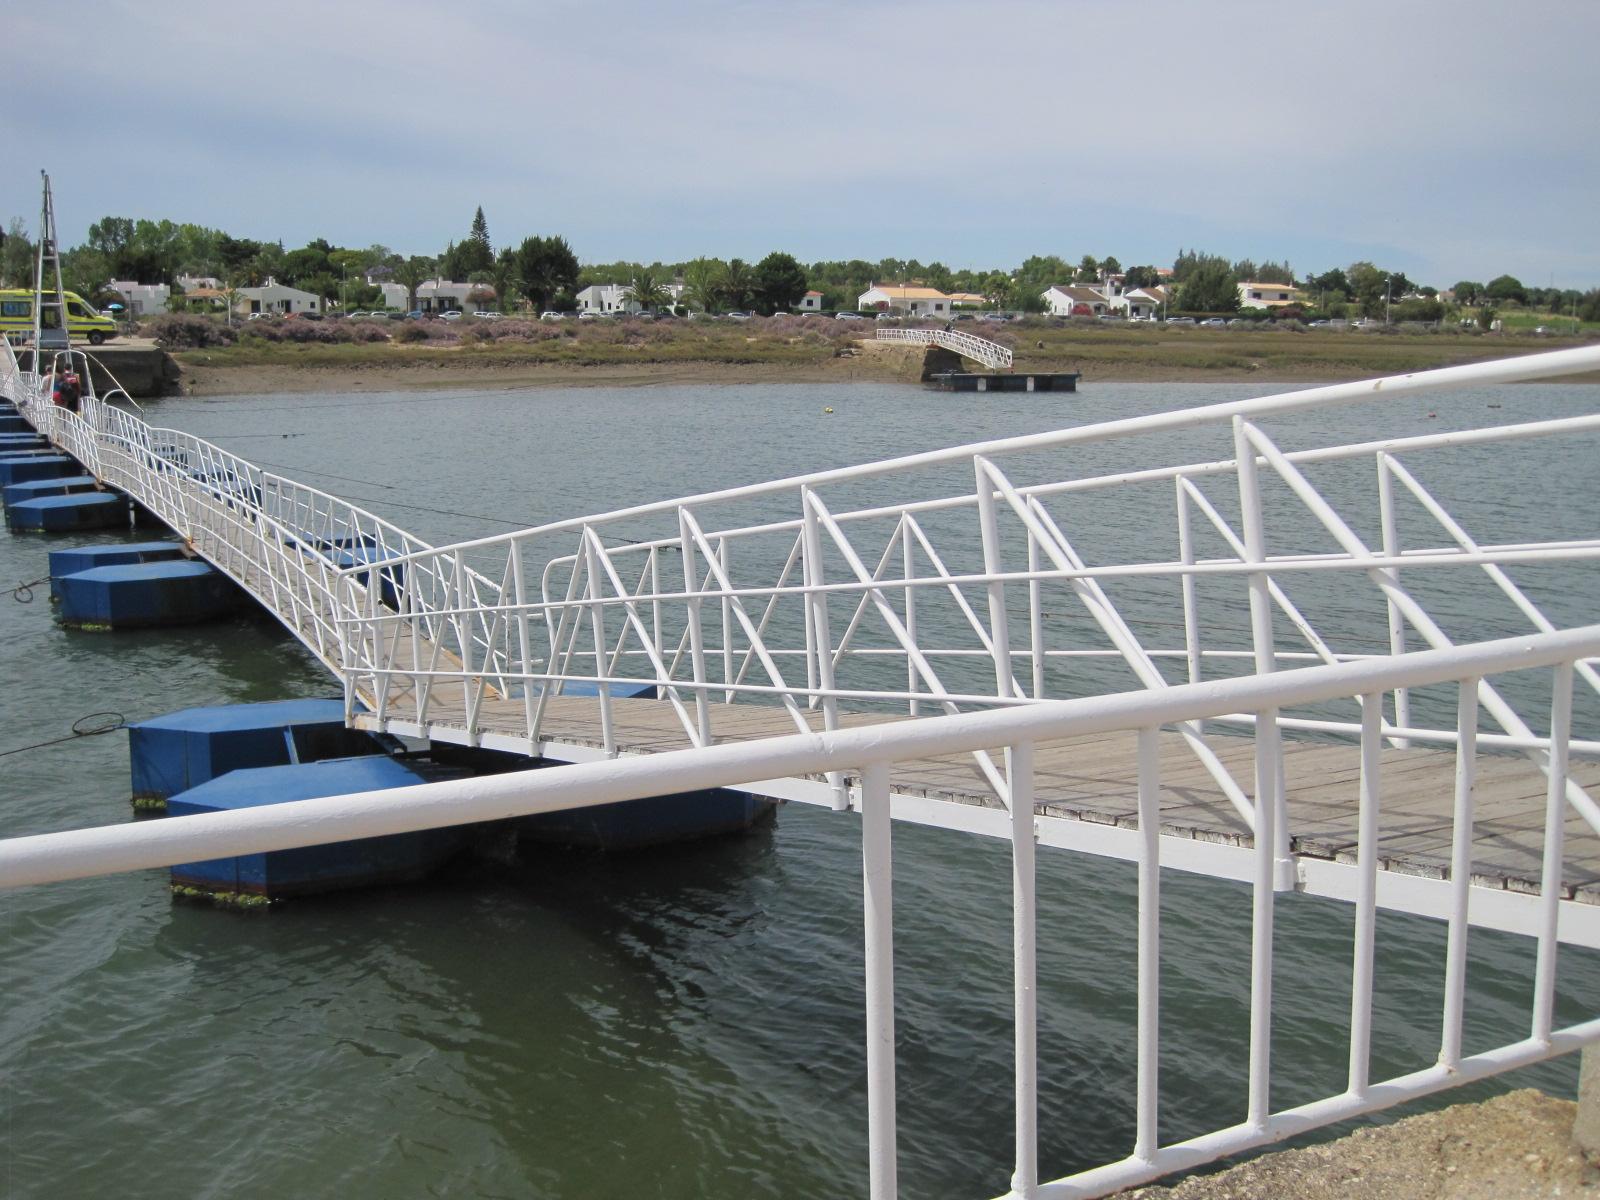 Looking back over the pontoon to Pedras d'el Rei